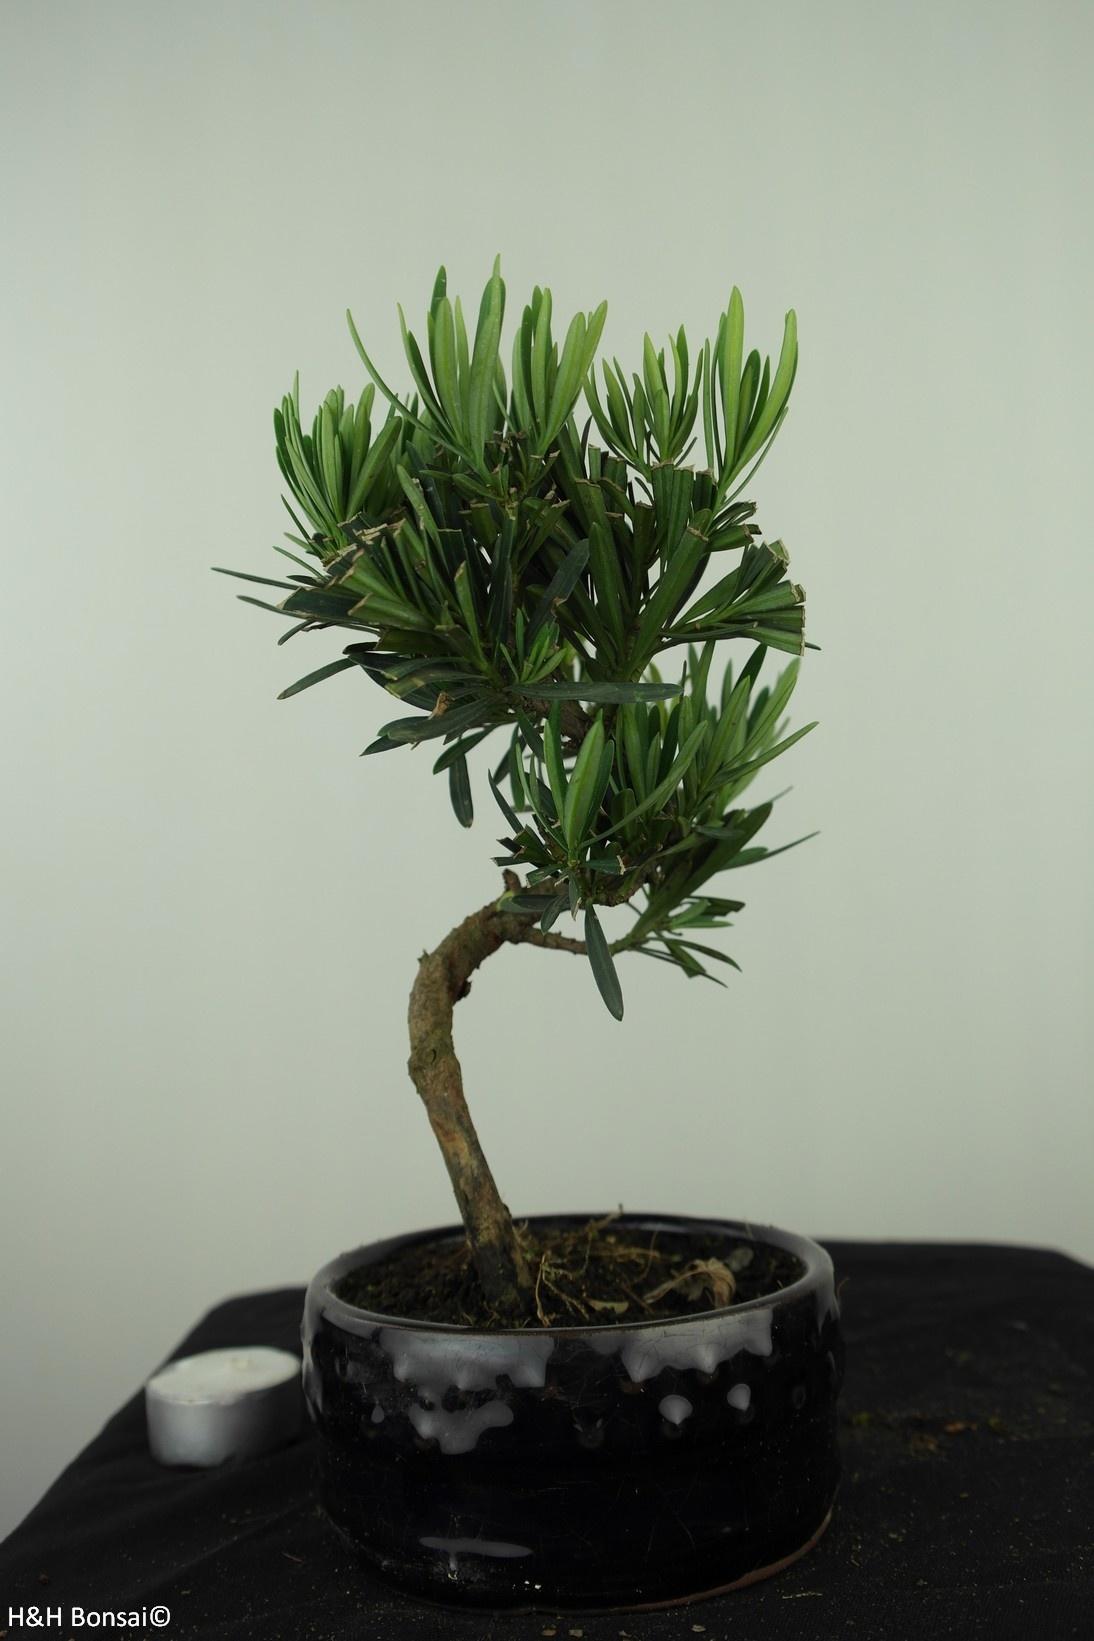 Bonsai Chin. Steineibe, Podocarpus, nr. 7564